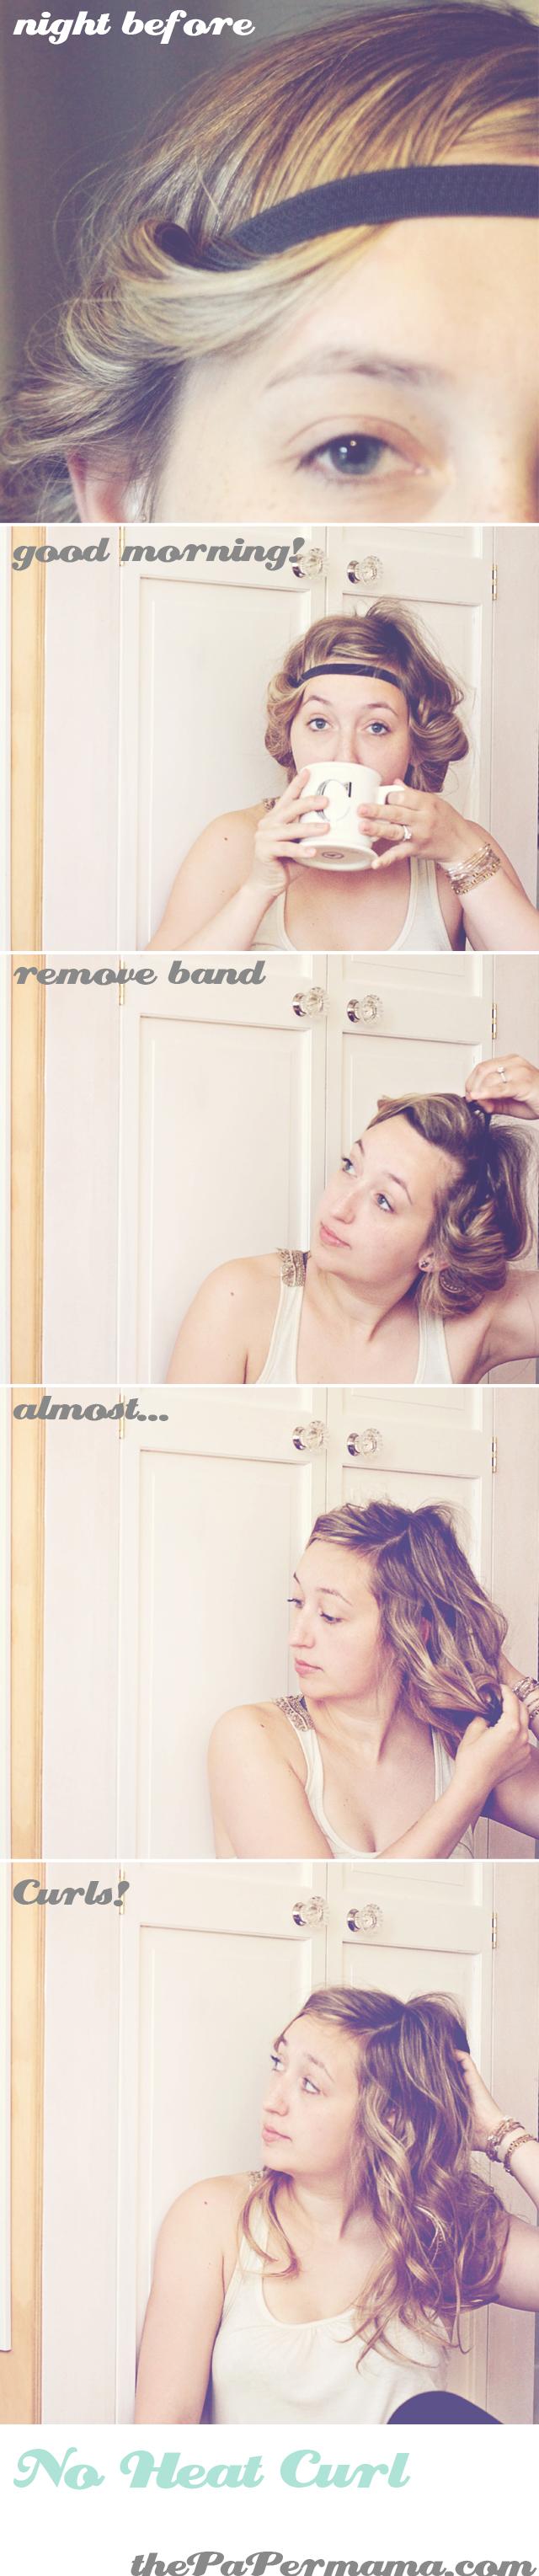 Hair Tutorial: No Heat Curl headband tutorial